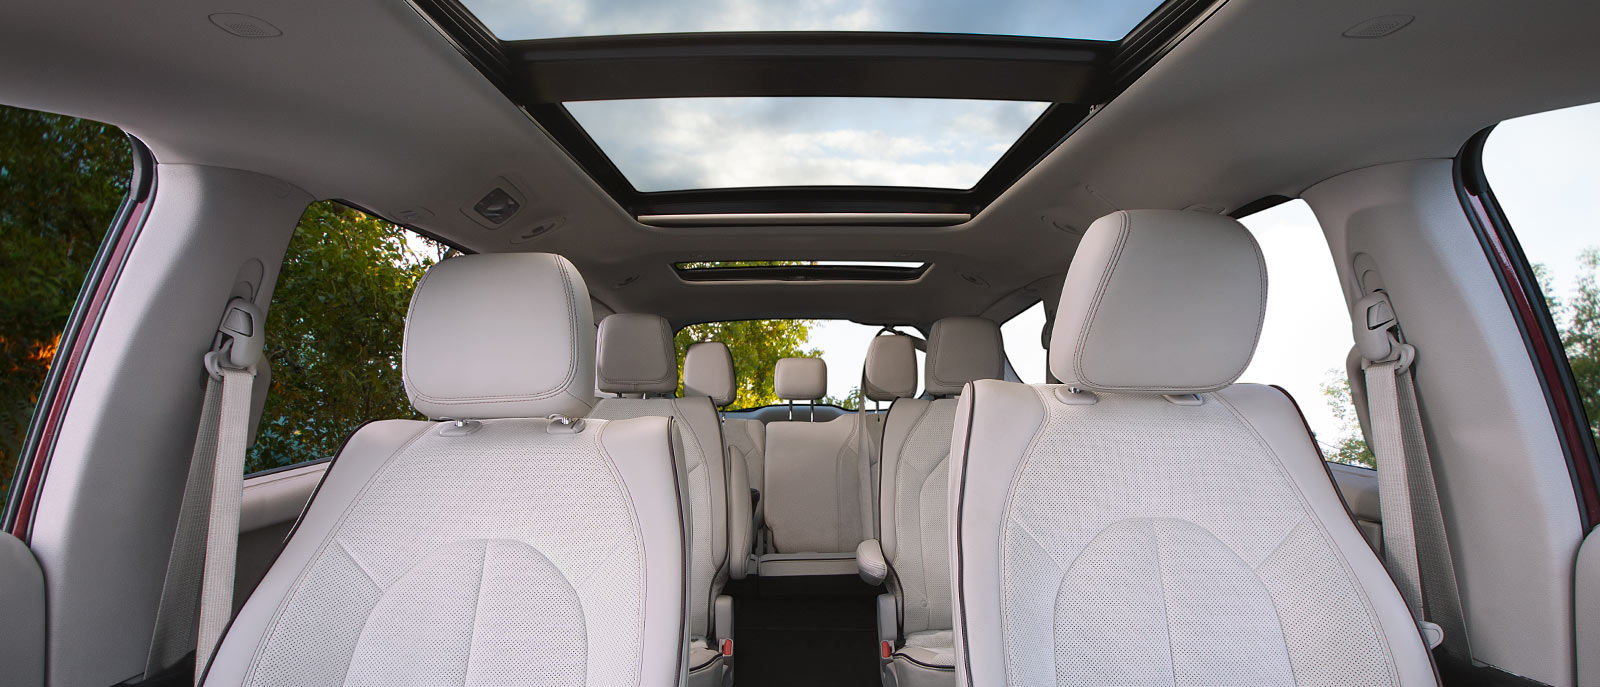 2017 chrysler pacifica liberty chrysler jeep rapid city sd for Chrysler pacifica 2017 interior